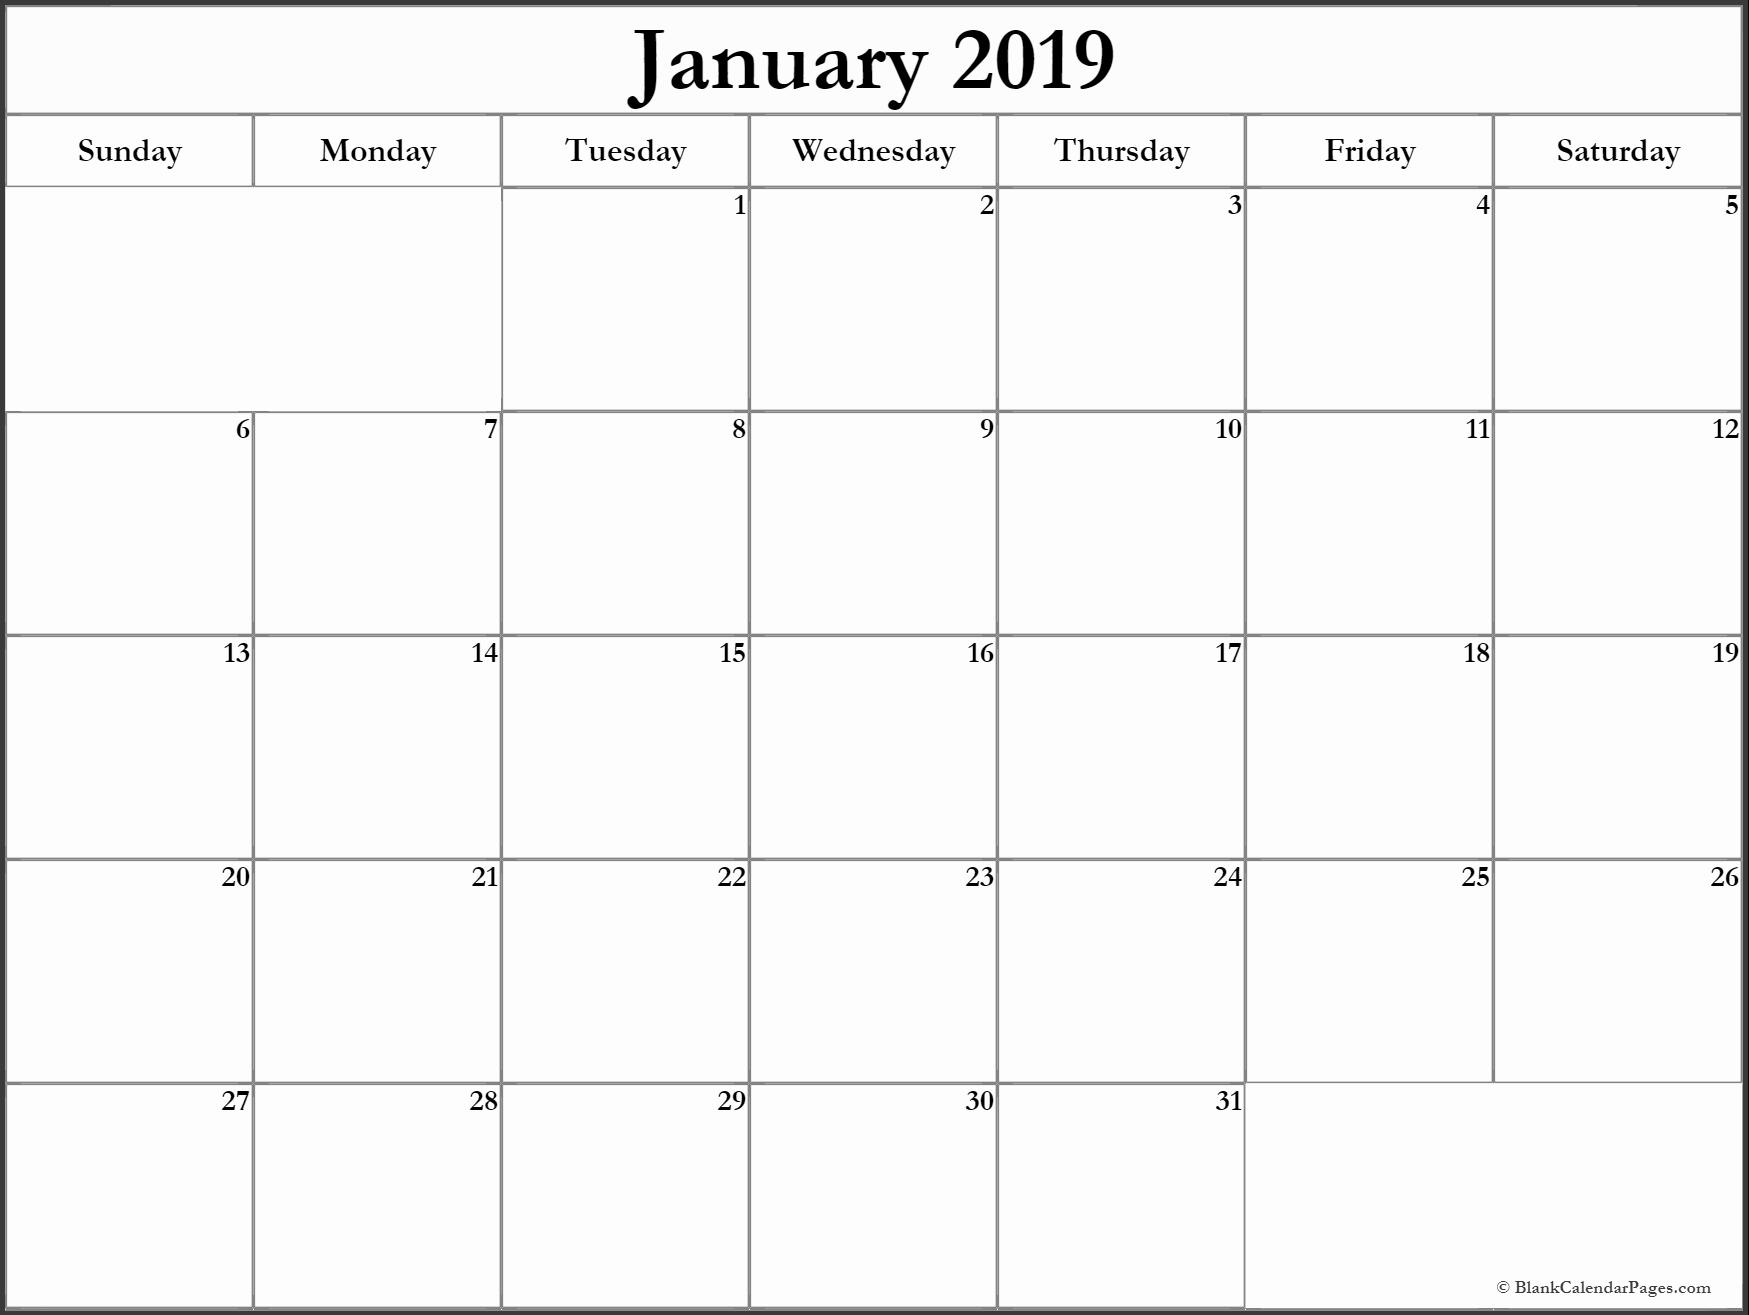 Free Monthly Calendar Template 2019 New Printable January 2019 Calendar